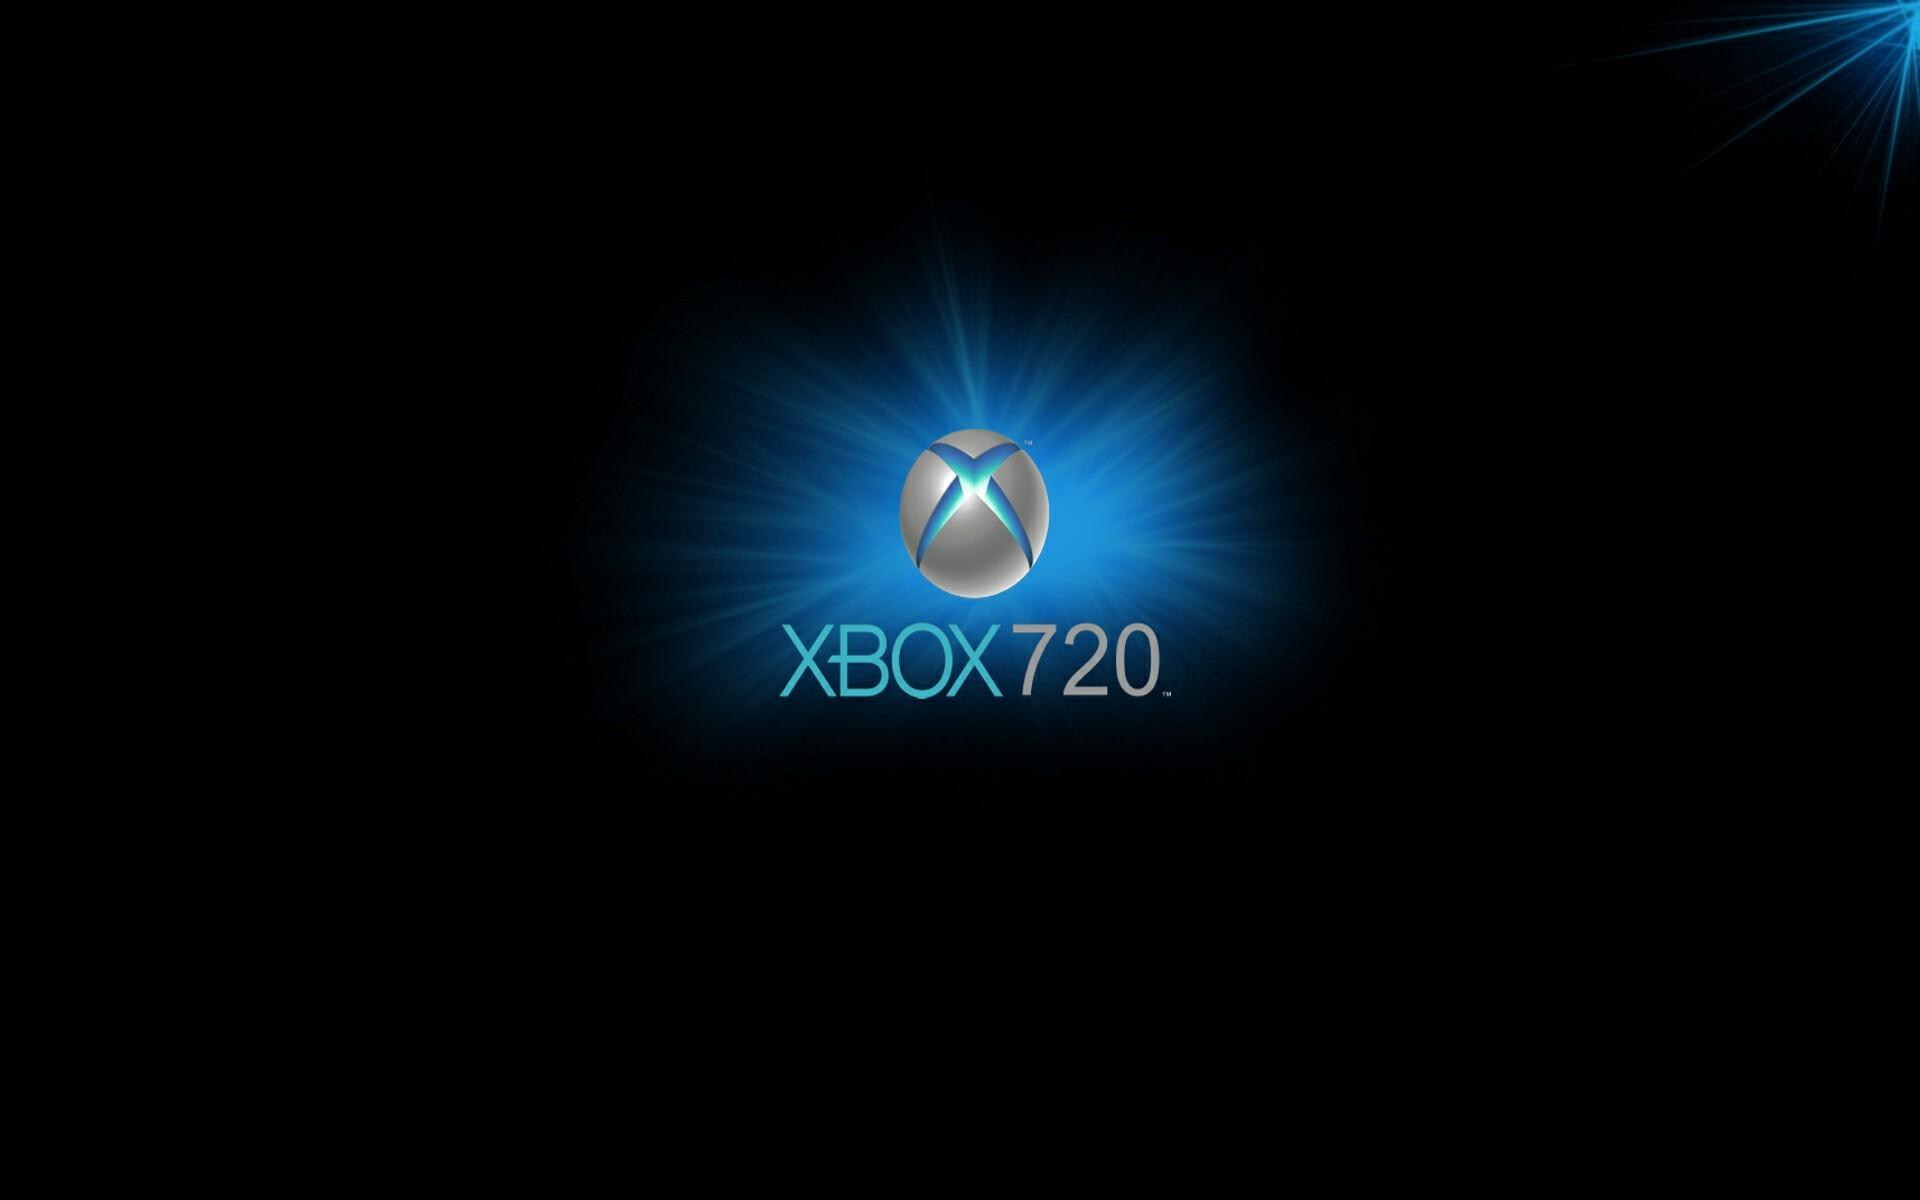 Xbox 360 Wallpaper Hd - WallpaperSafari